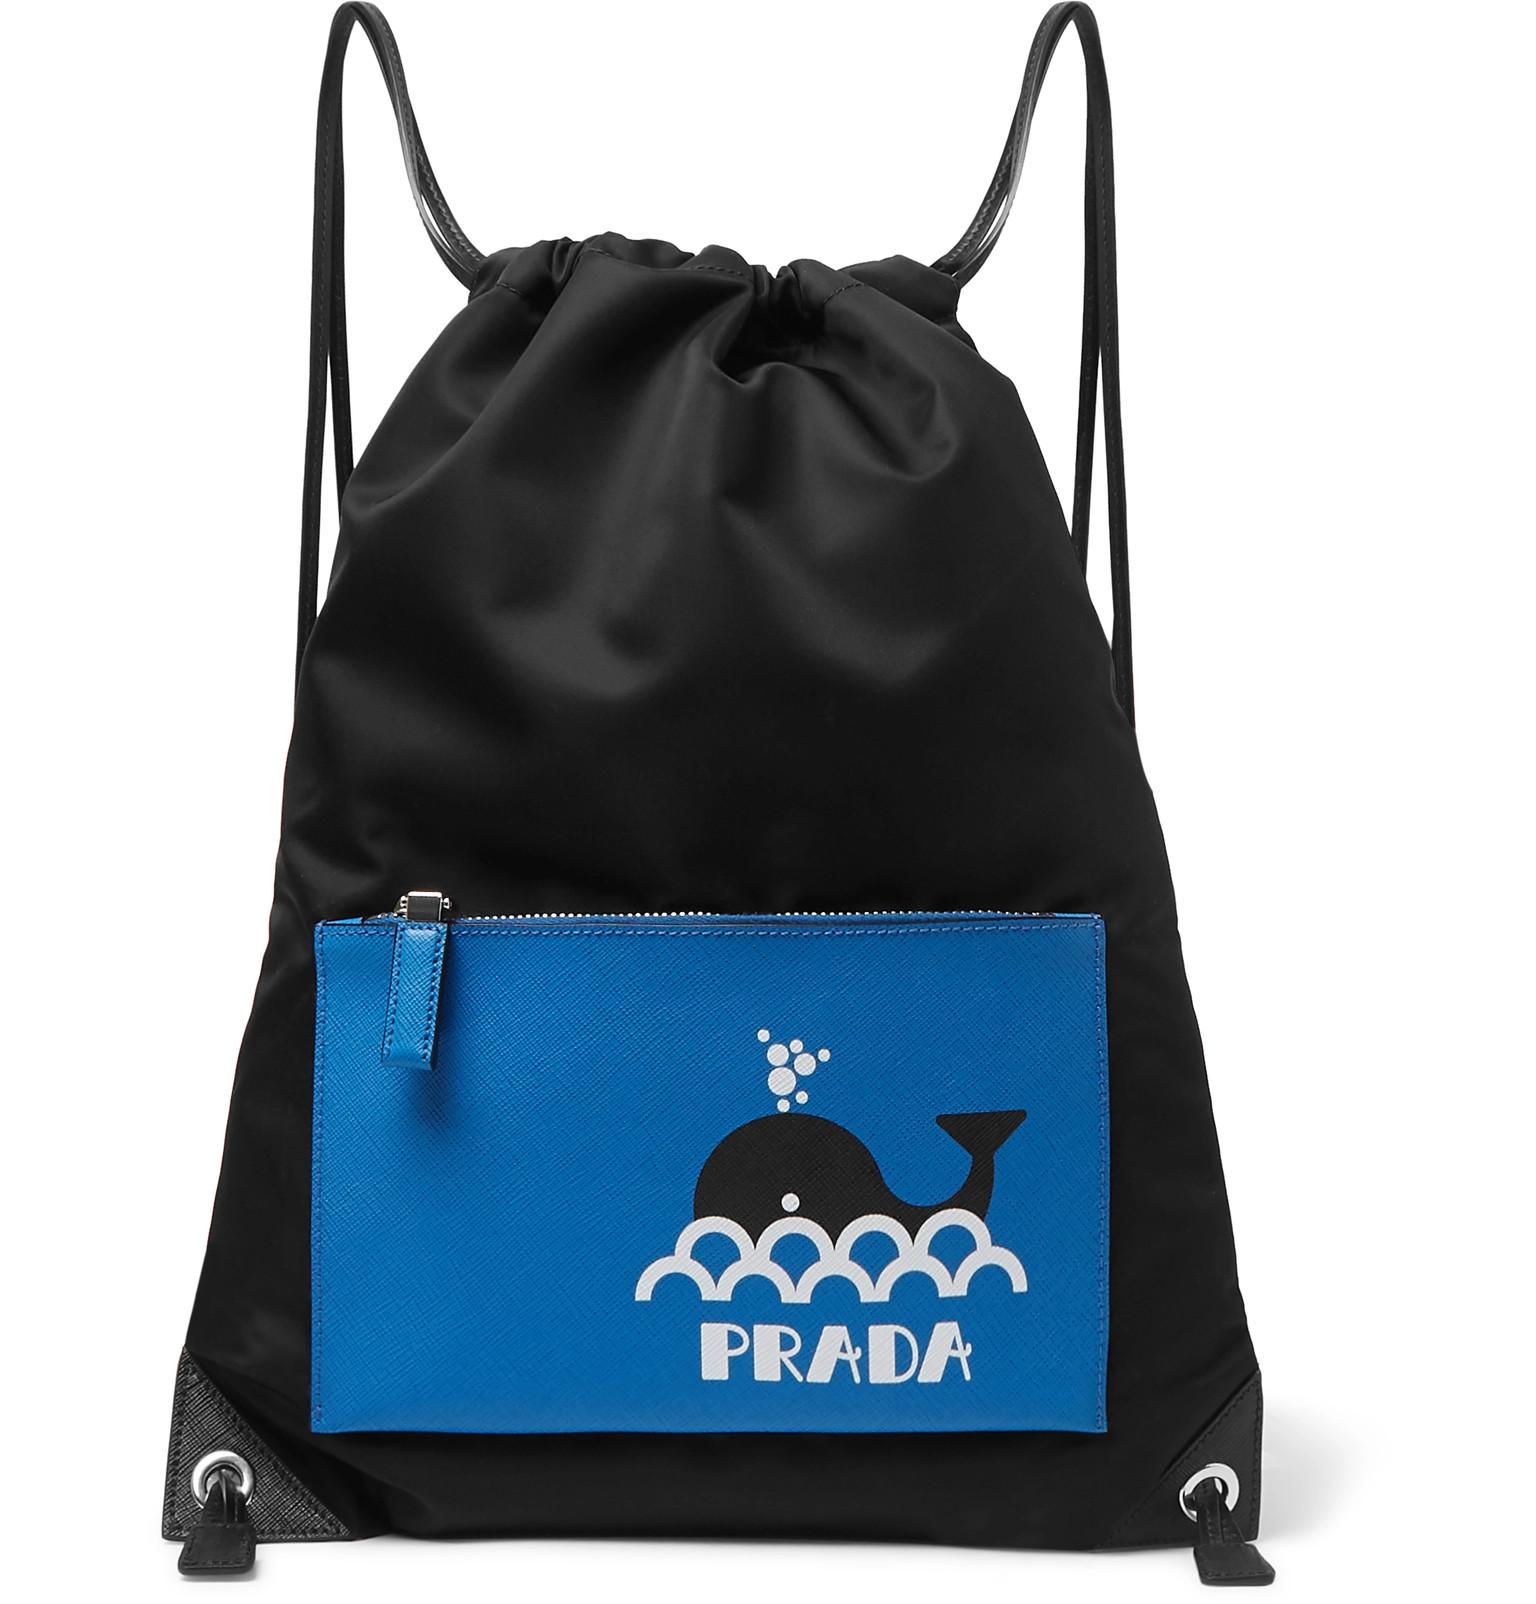 441654deb1eaeb Prada - Printed Saffiano Leather and Nylon Backpack